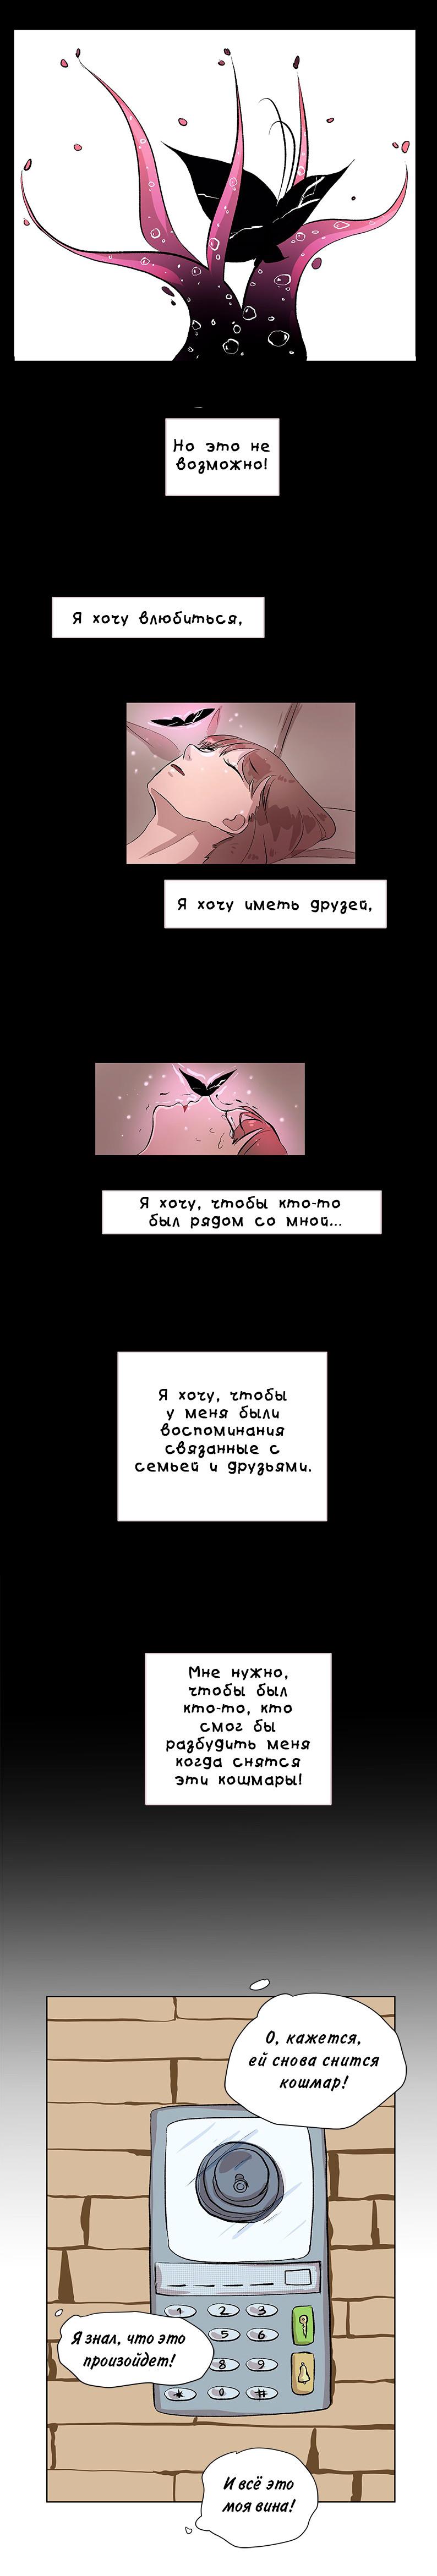 https://r1.ninemanga.com/comics/pic2/58/31802/316268/1484292048862.jpg Page 4